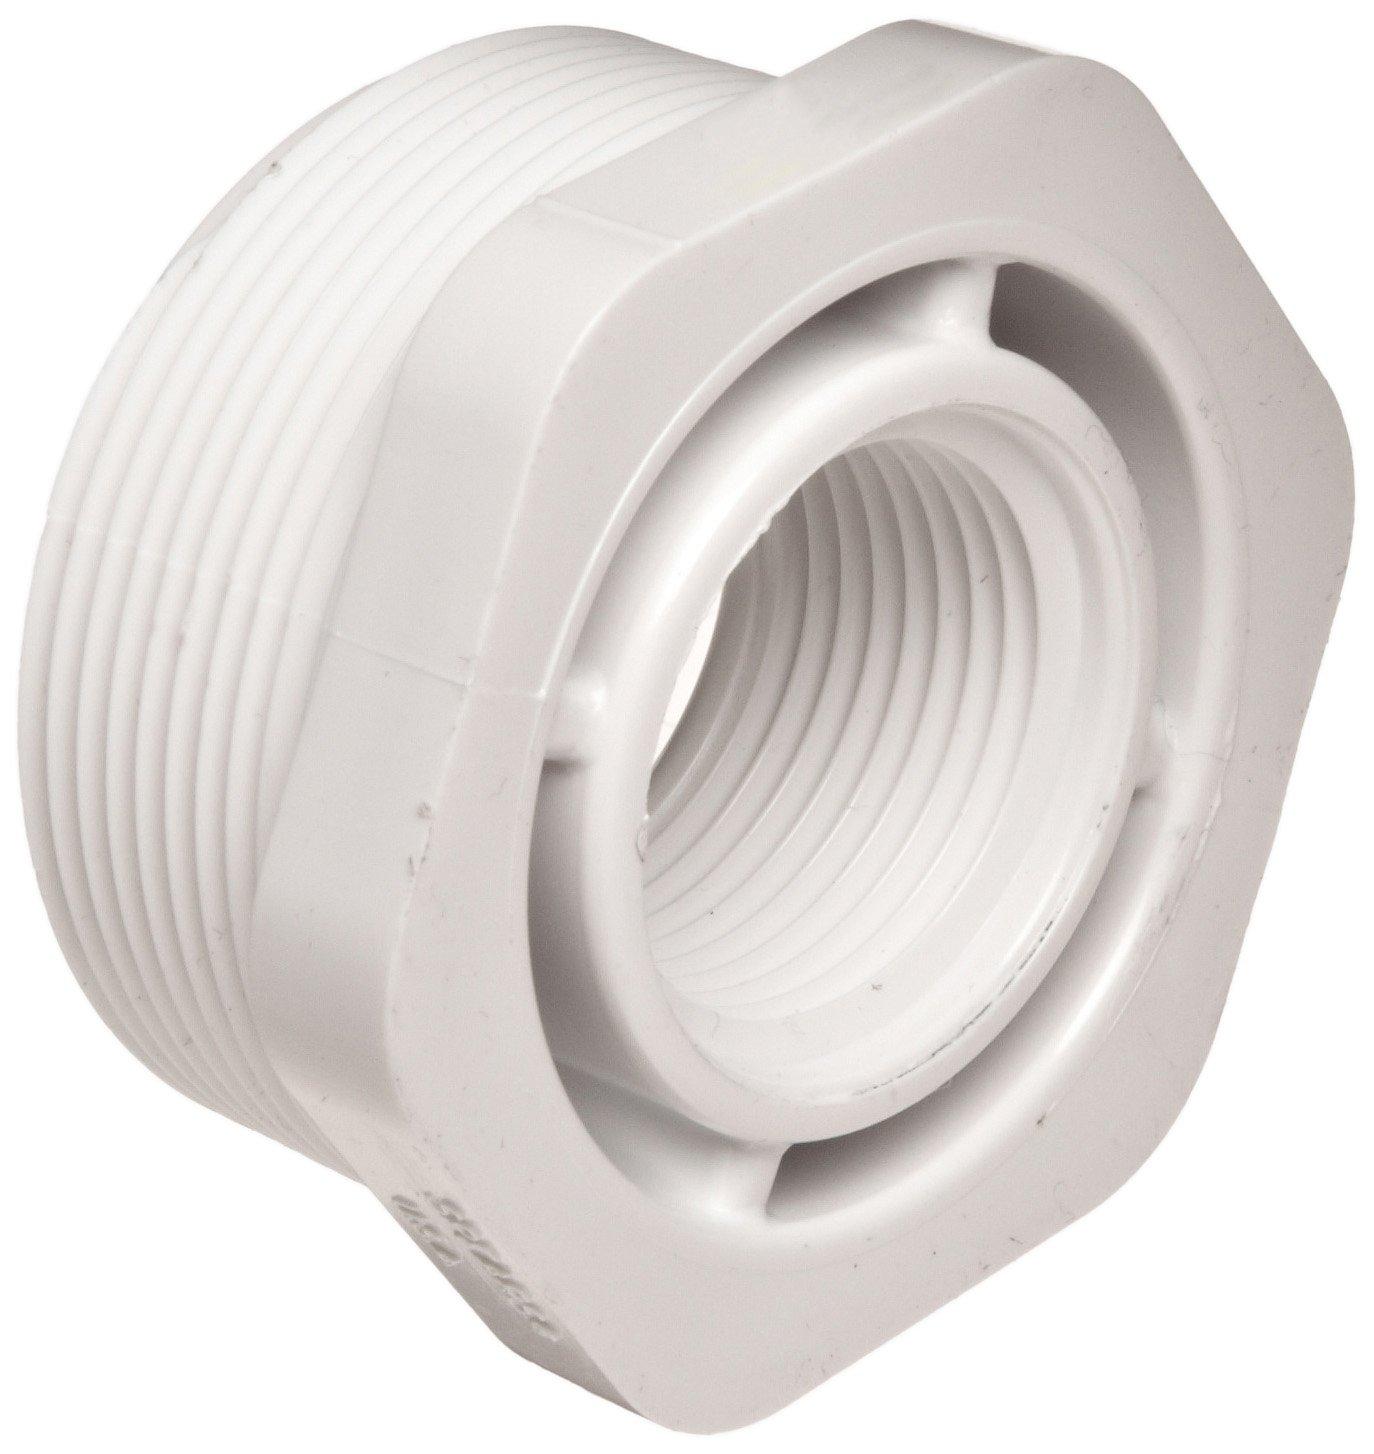 Flowline LM52-1400 PVC Reducer Bushing, 2'' x 1'' NPT Thread